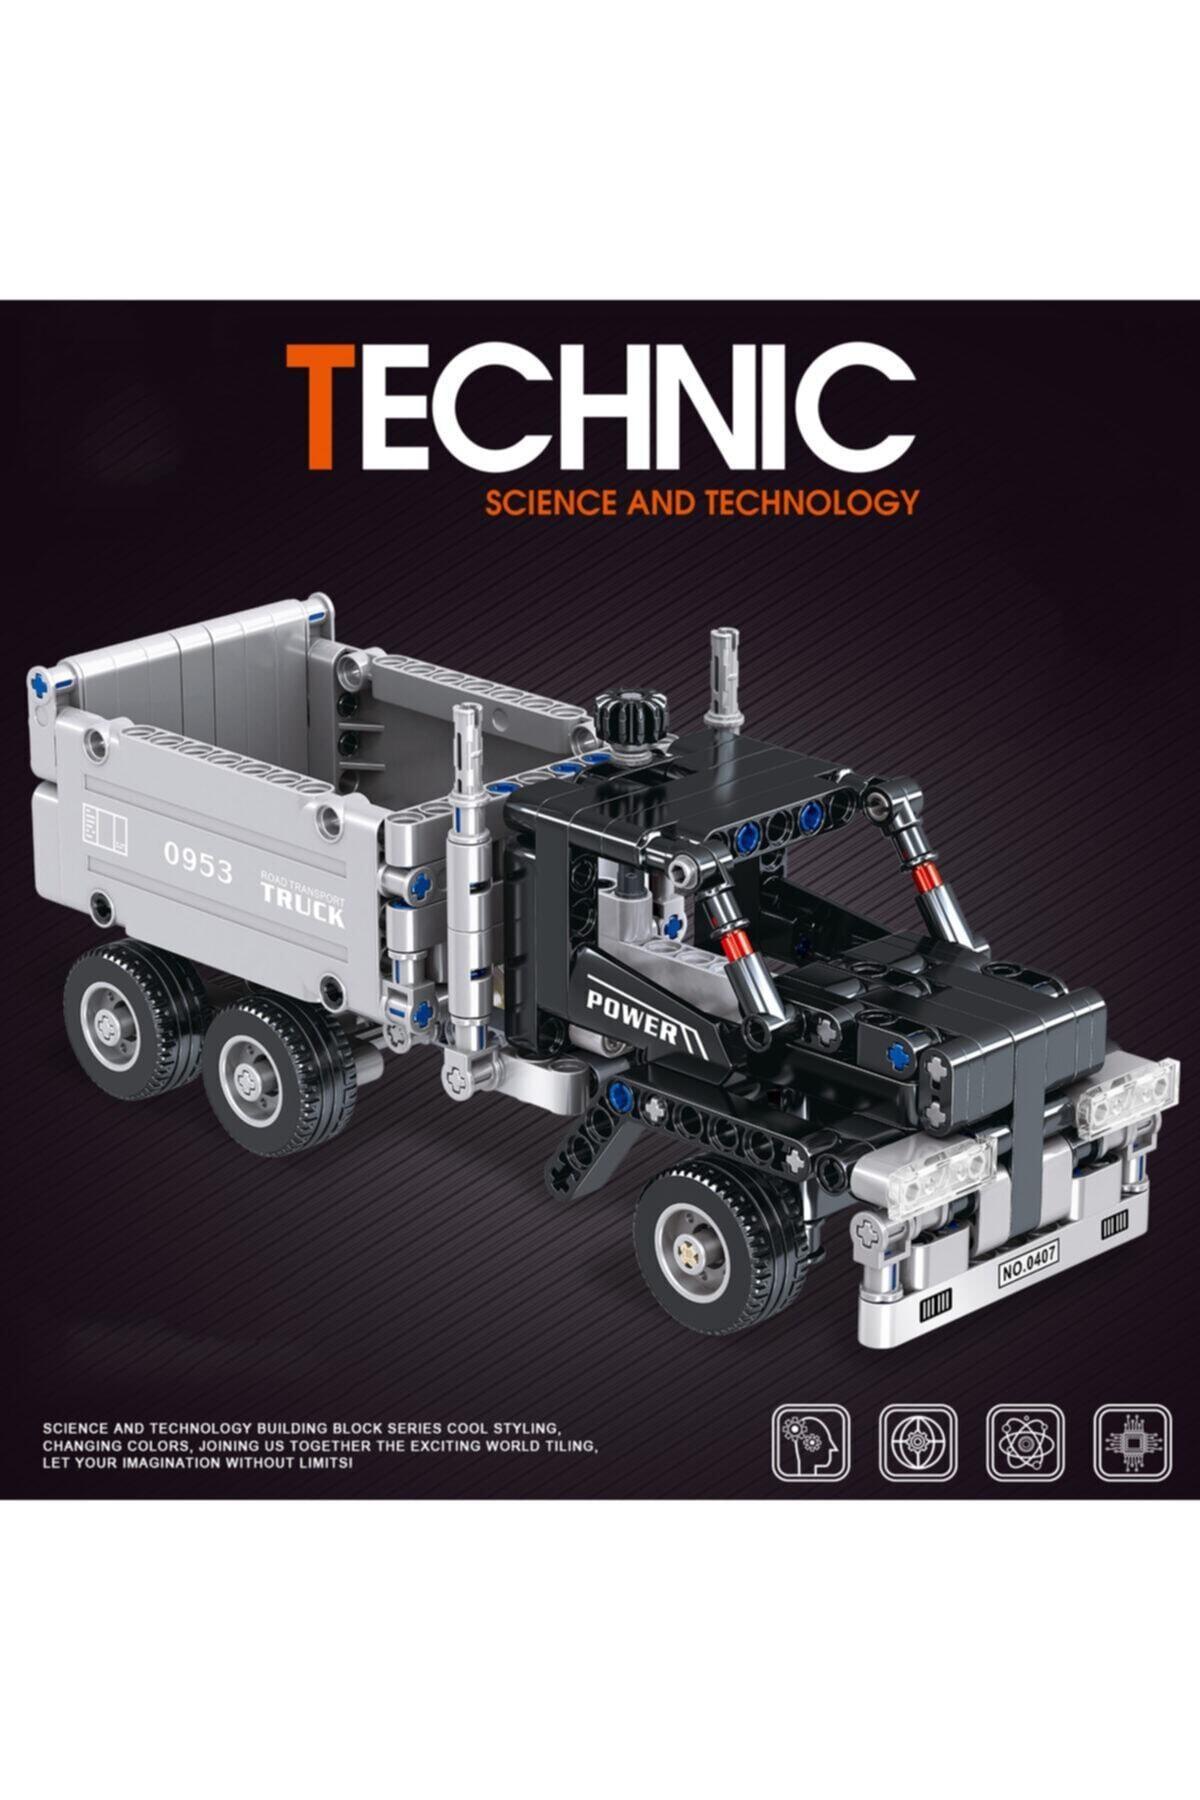 TECHNIC 322 Parça Kamyon Inşaat Iş Makinesi Power 1